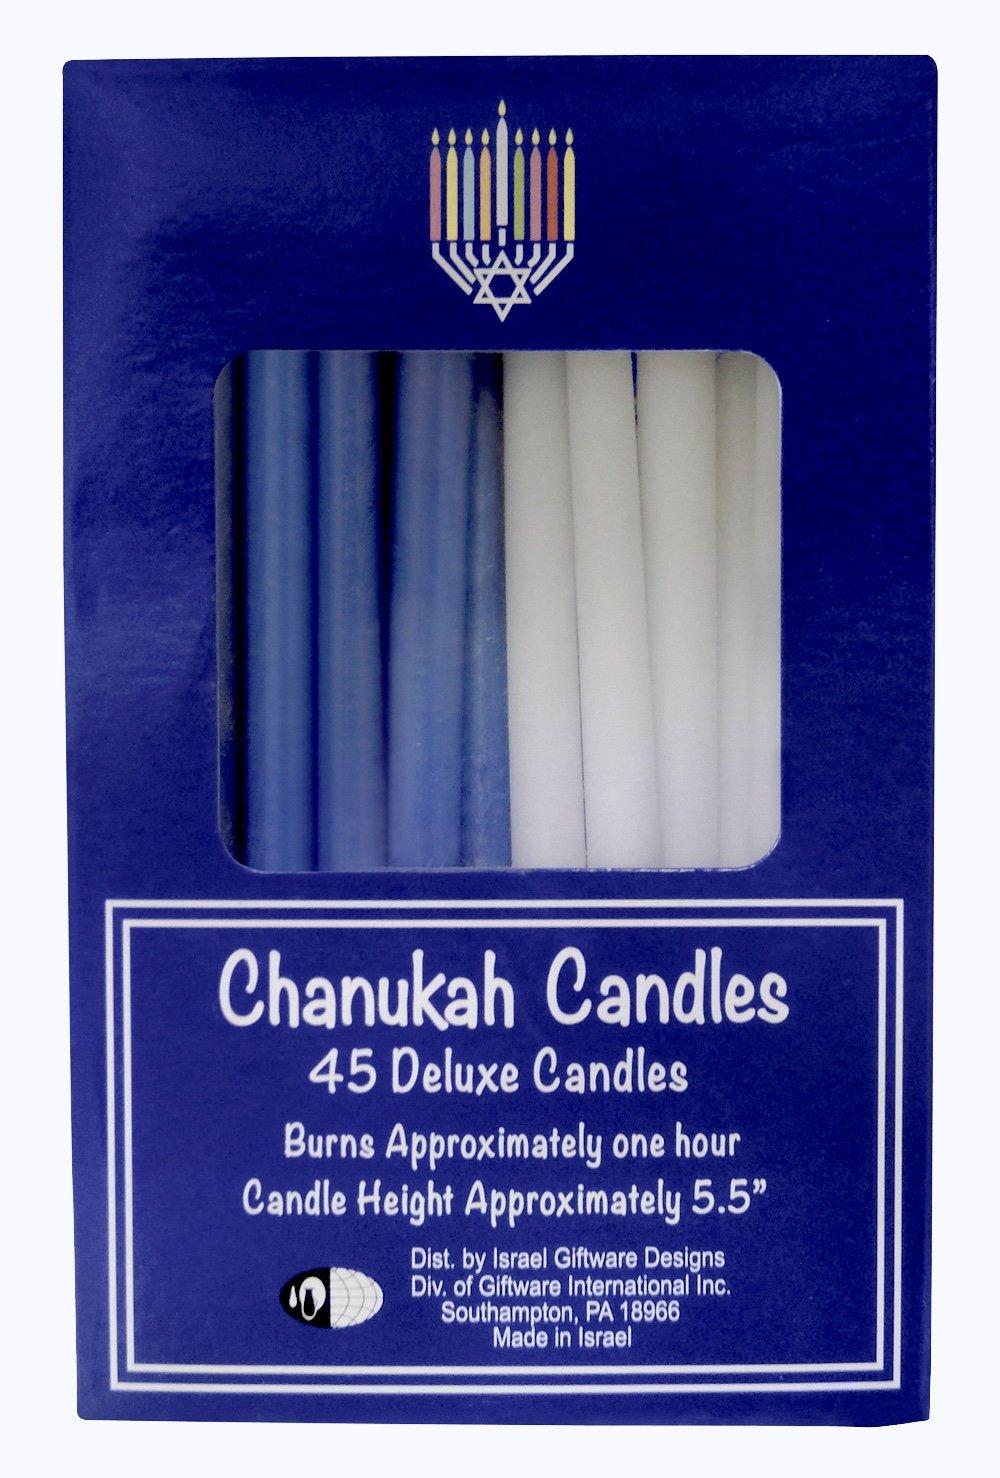 Chanukah Menorah Candles Blue & White 45 Per Box Made in Israel Generic